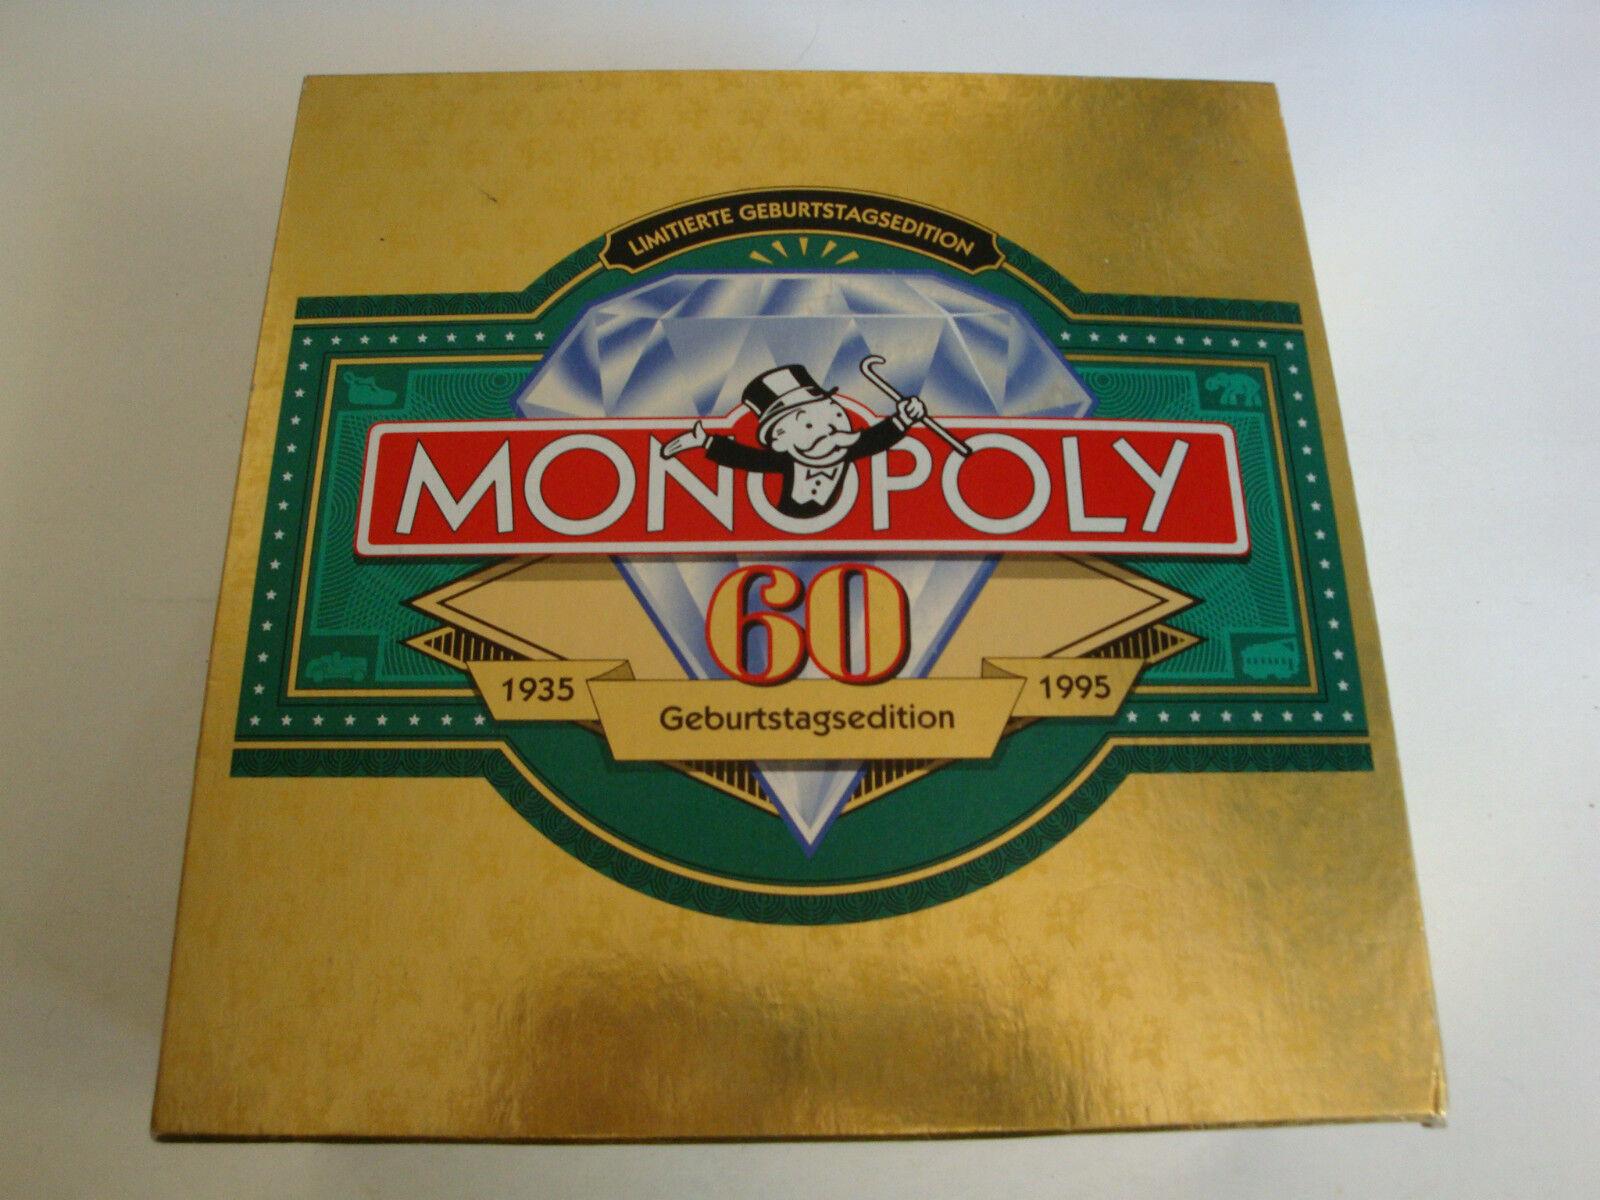 MONOPOLY 60 ans anniversaire edition (1935-1995)